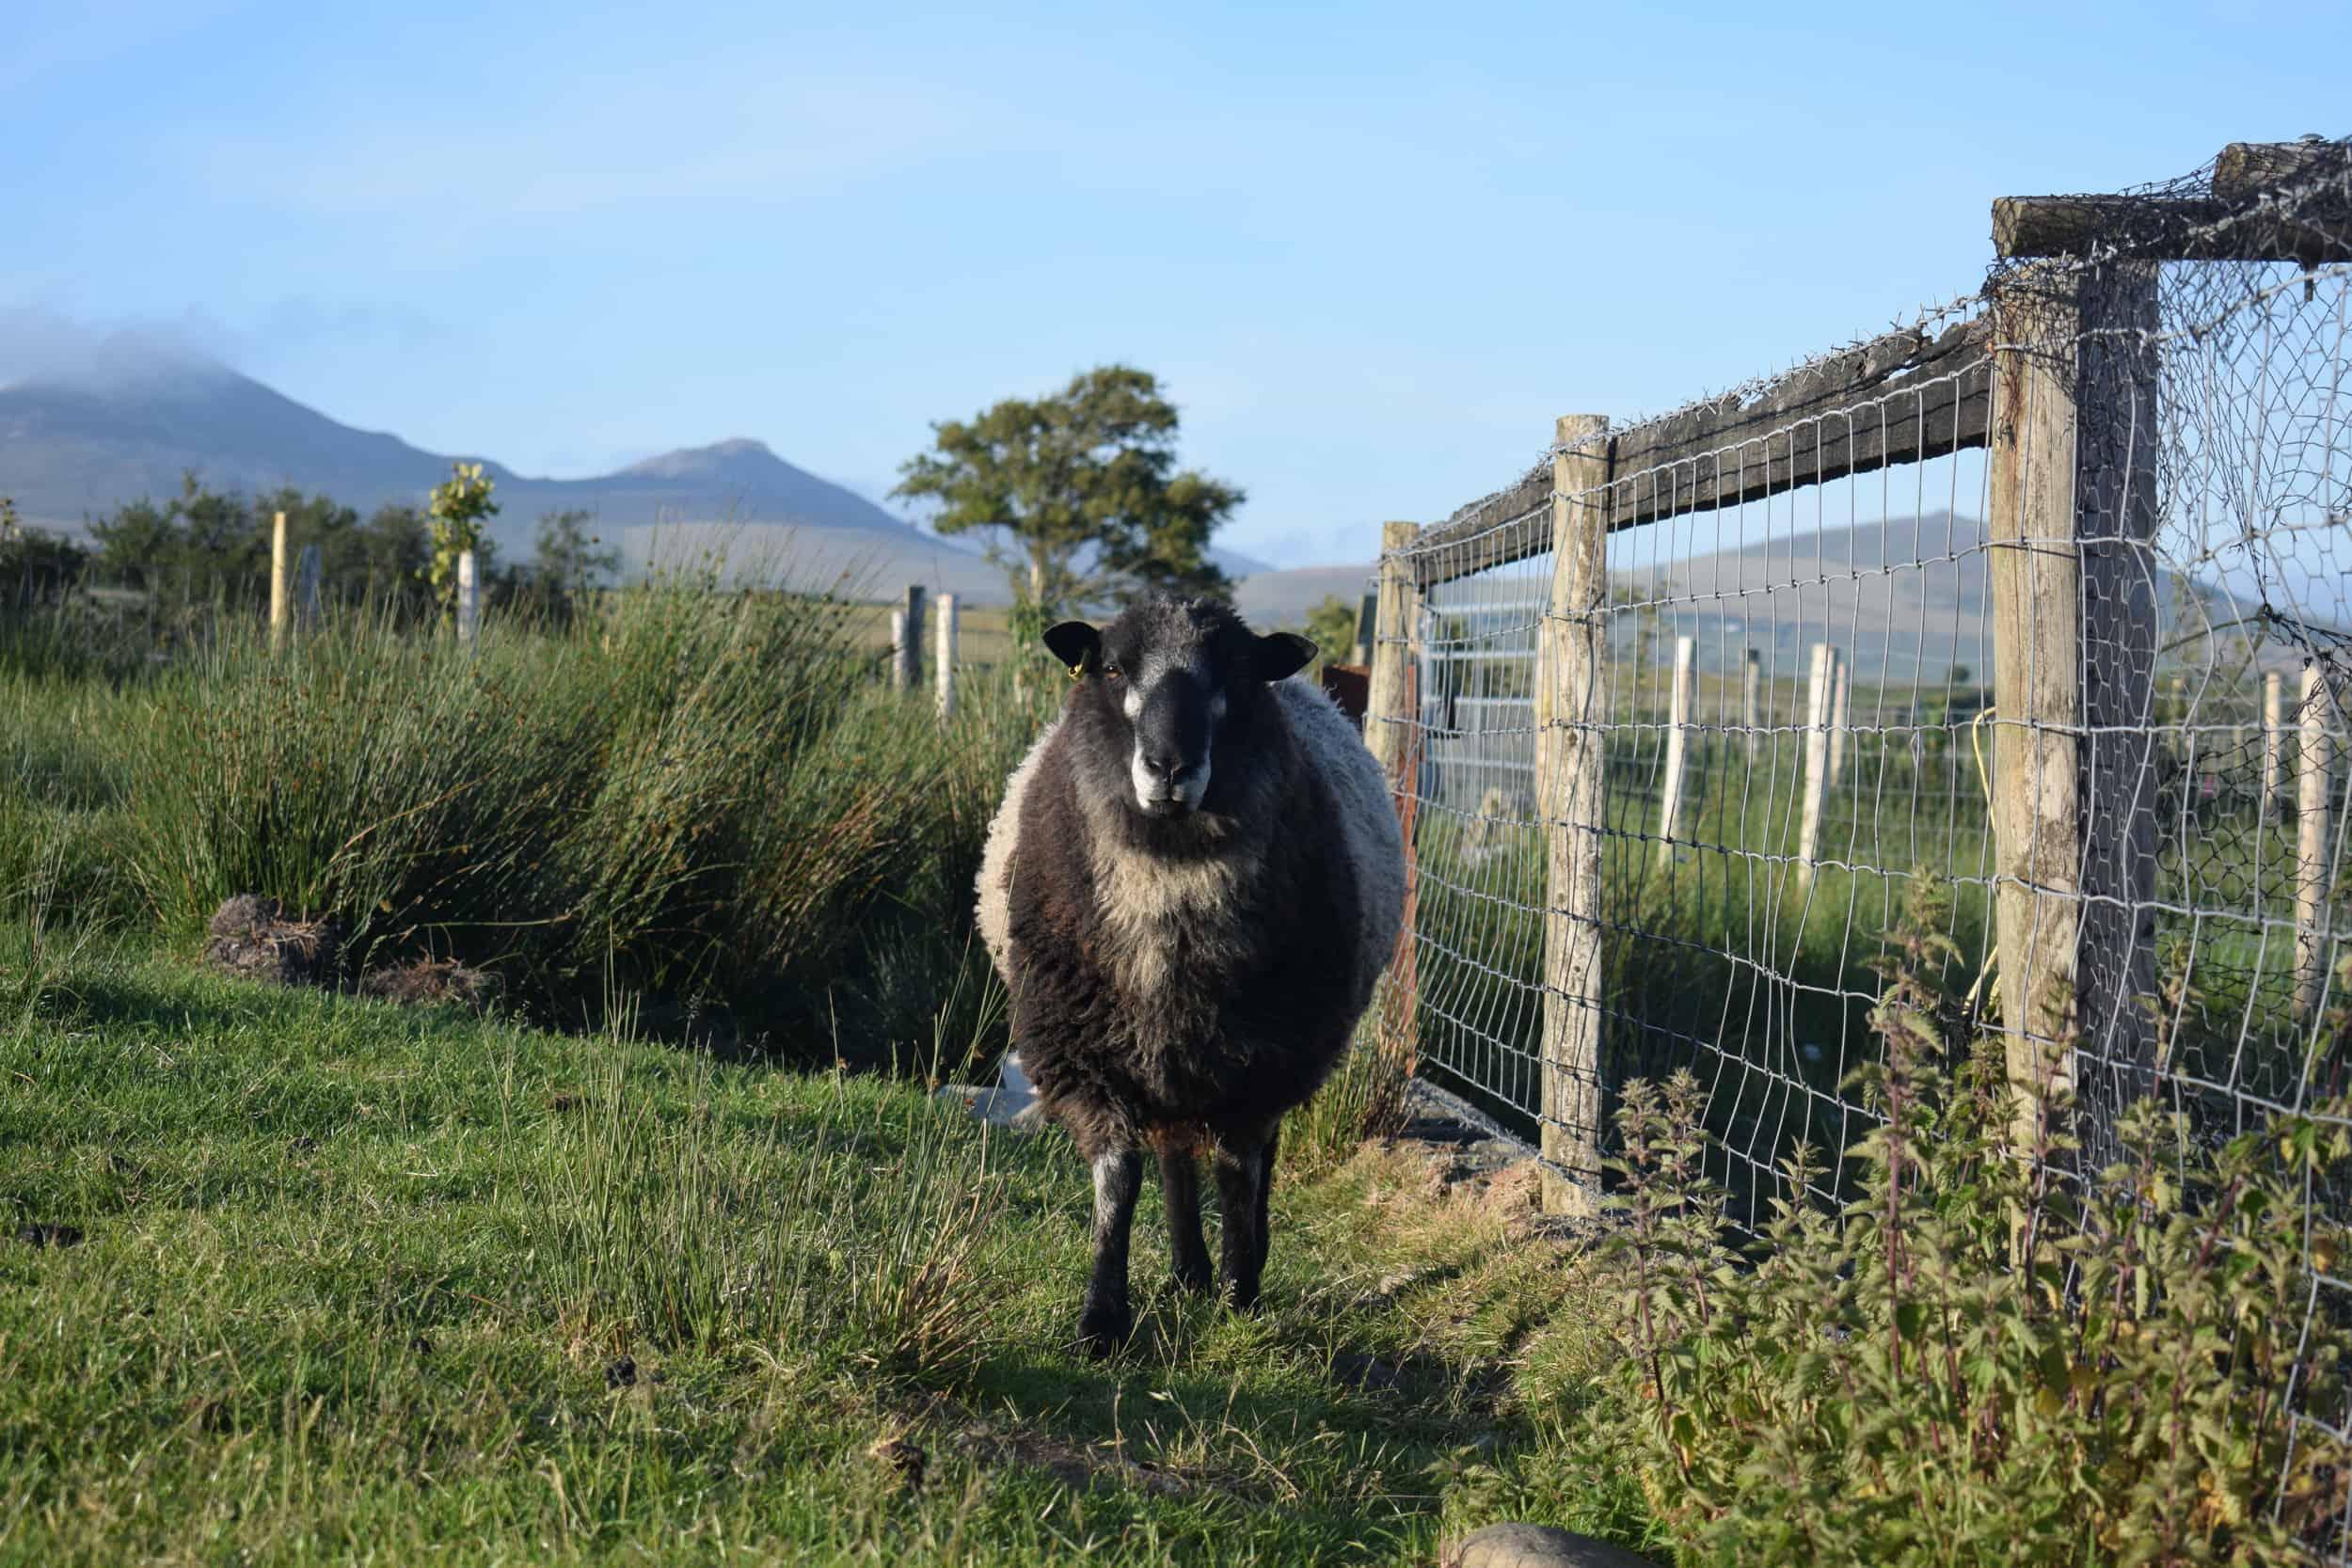 Bruno yearling ram coloured leicester longwool gotland shetland sheep crossbreed english blue kind fibre